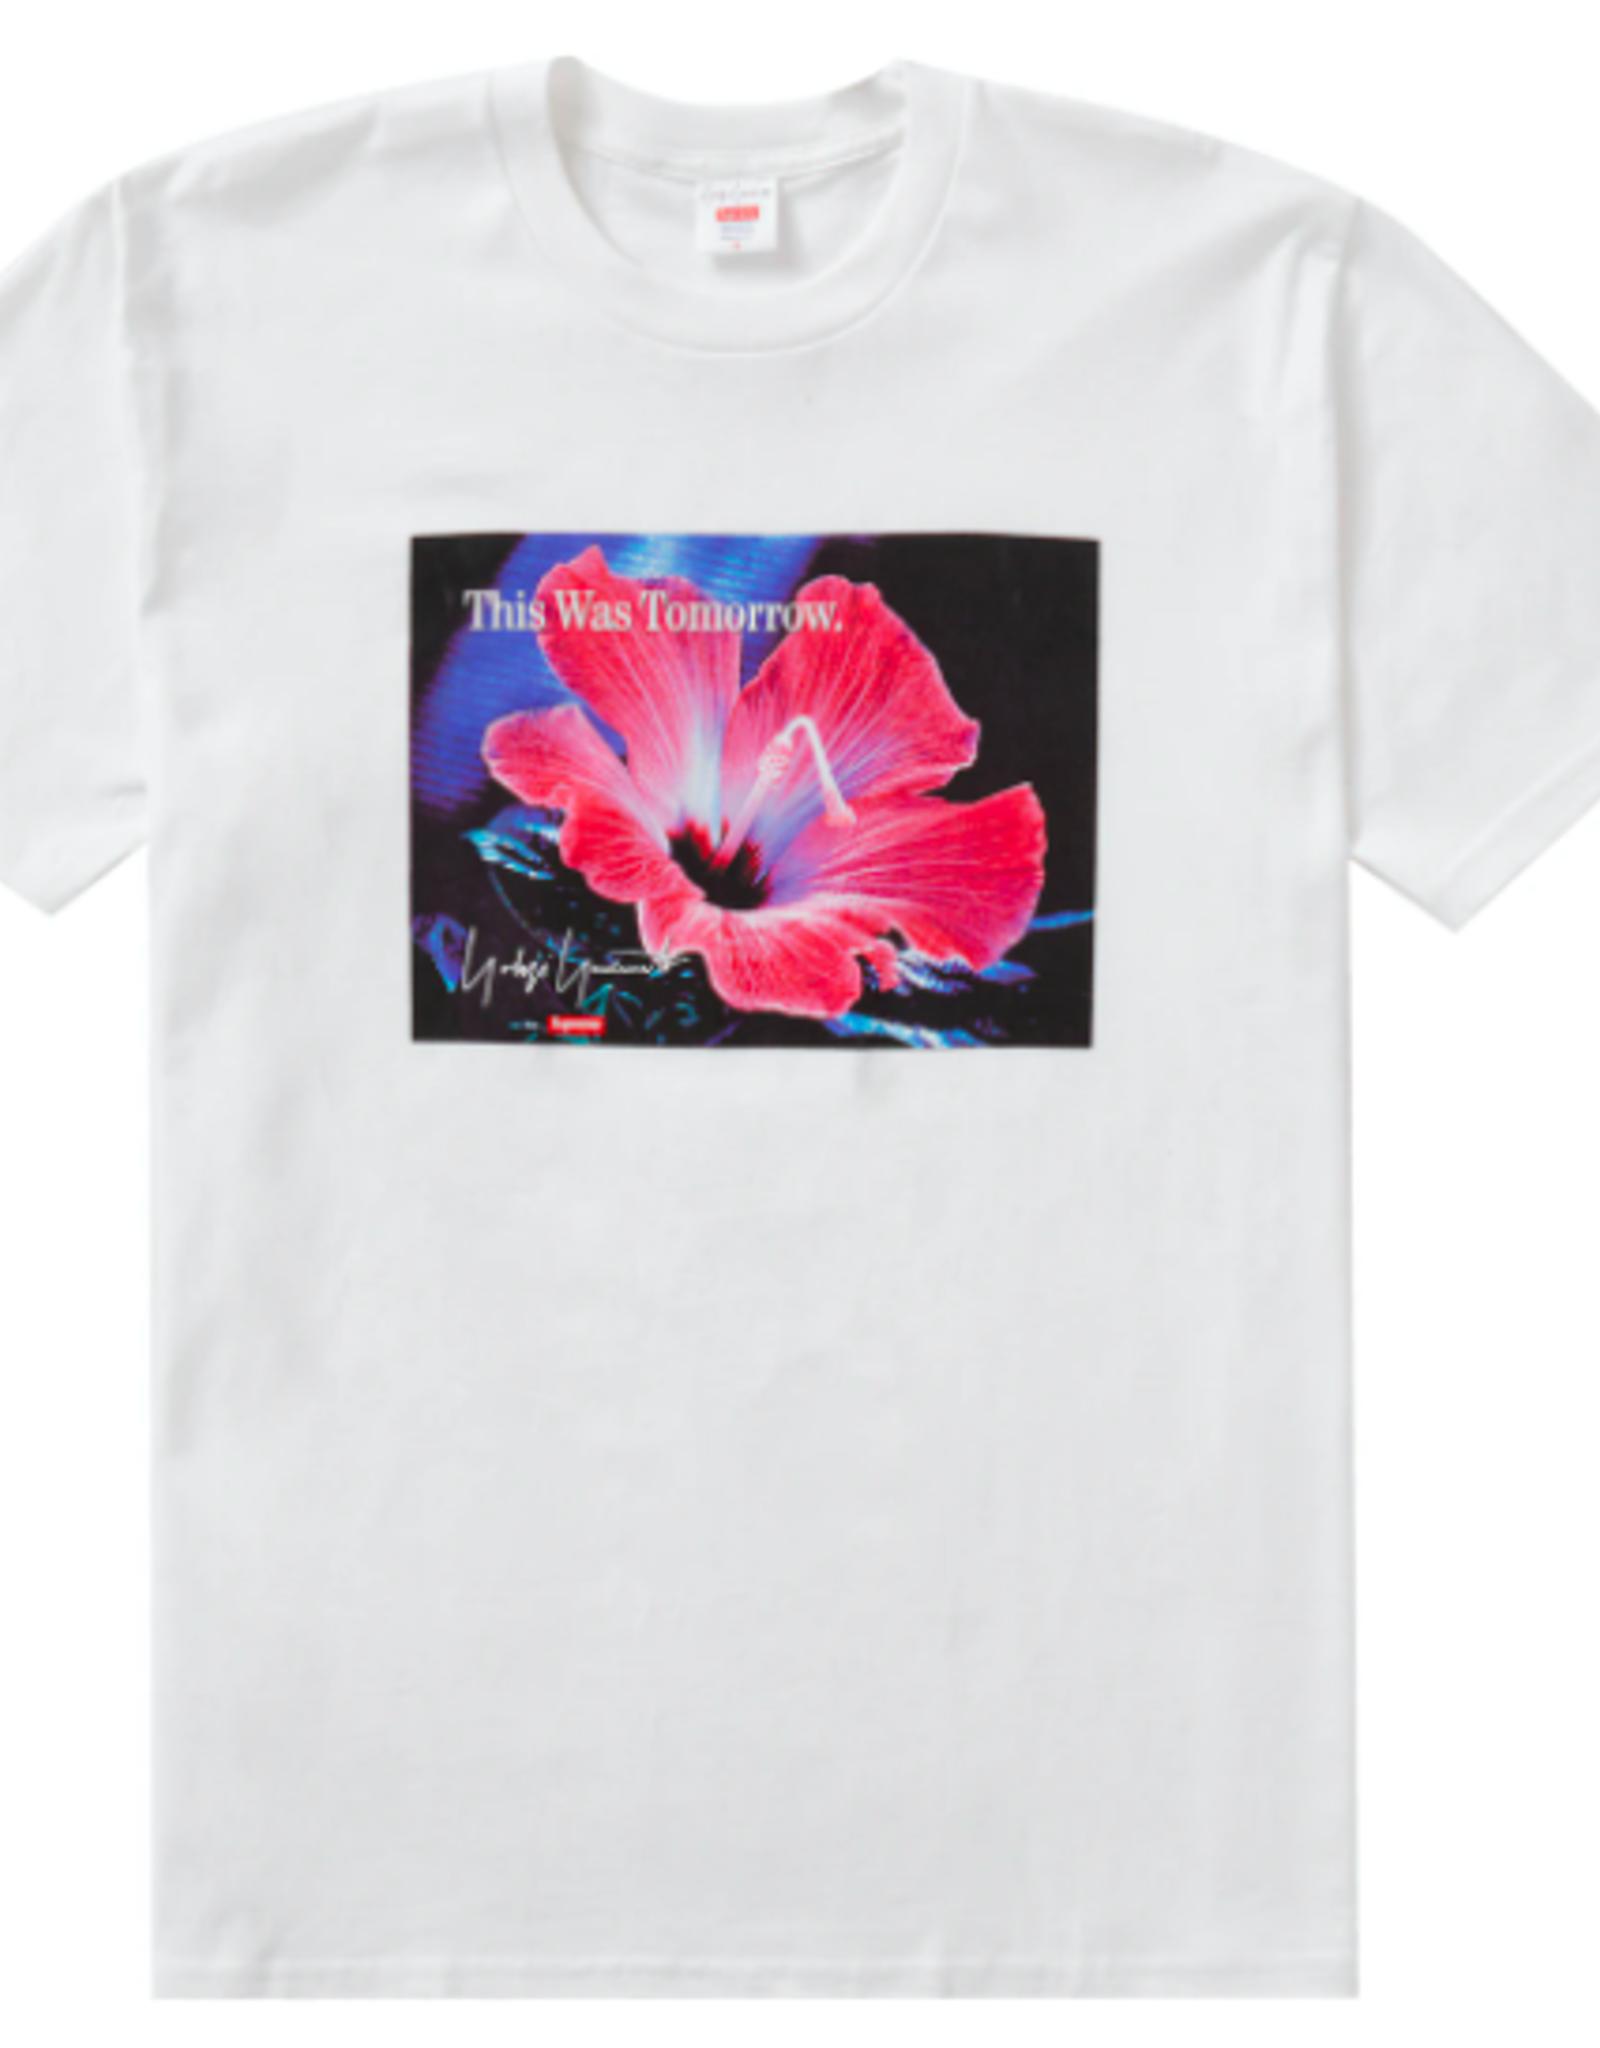 SUPREME Supreme Yohji Yamamoto This Was Tomorrow Tee White XL